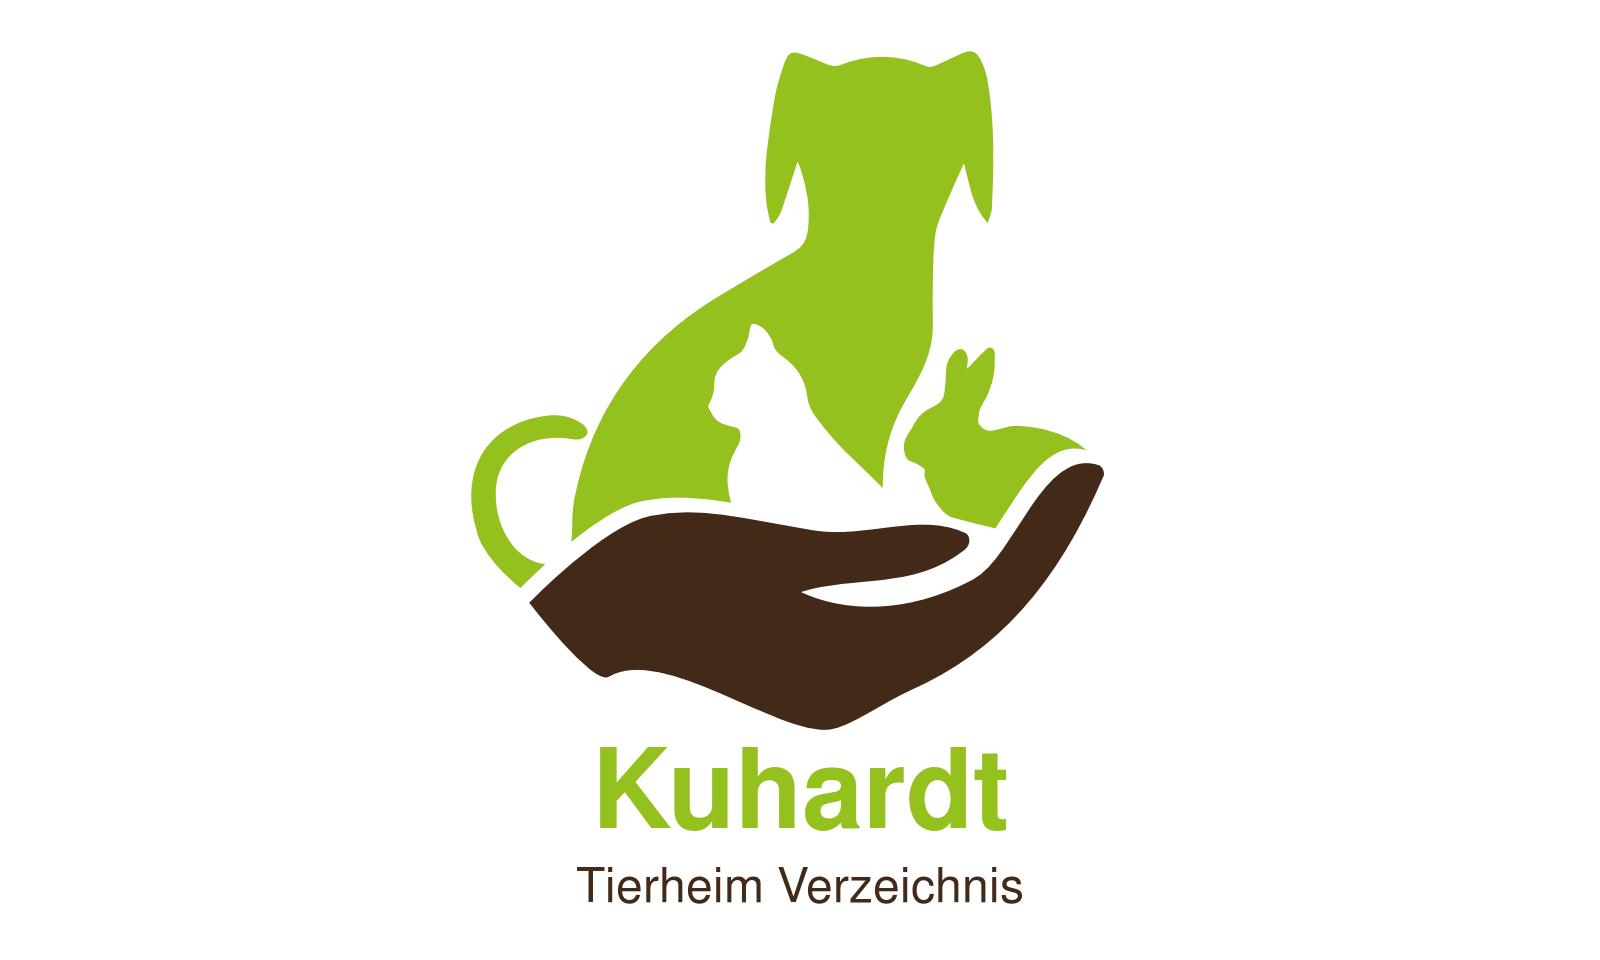 Tierheim Kuhardt